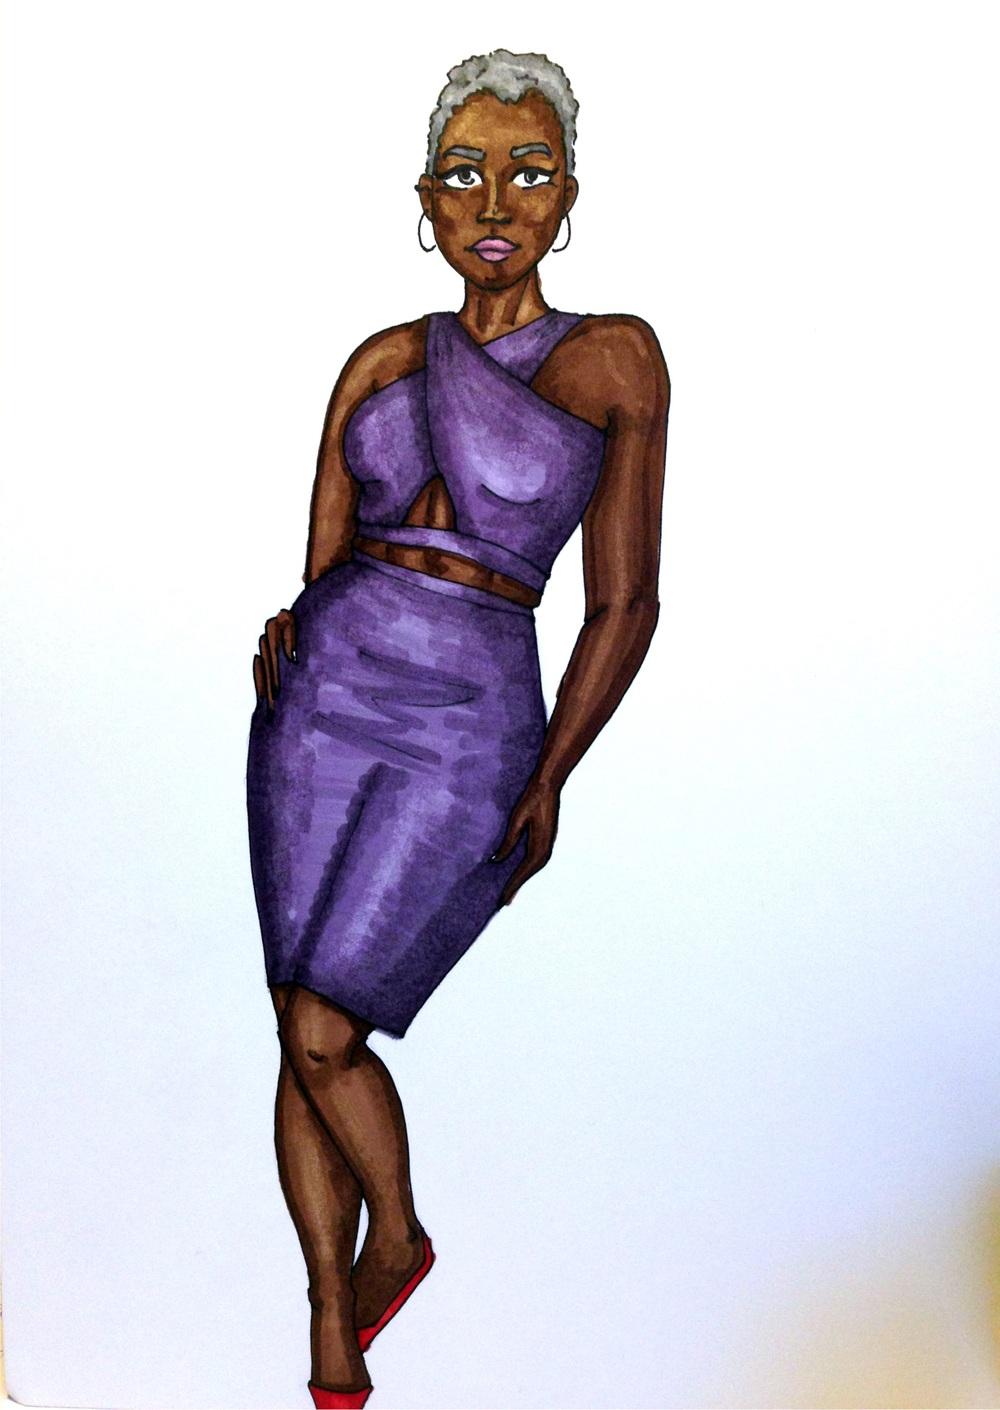 Illustration by Jordan Richardson